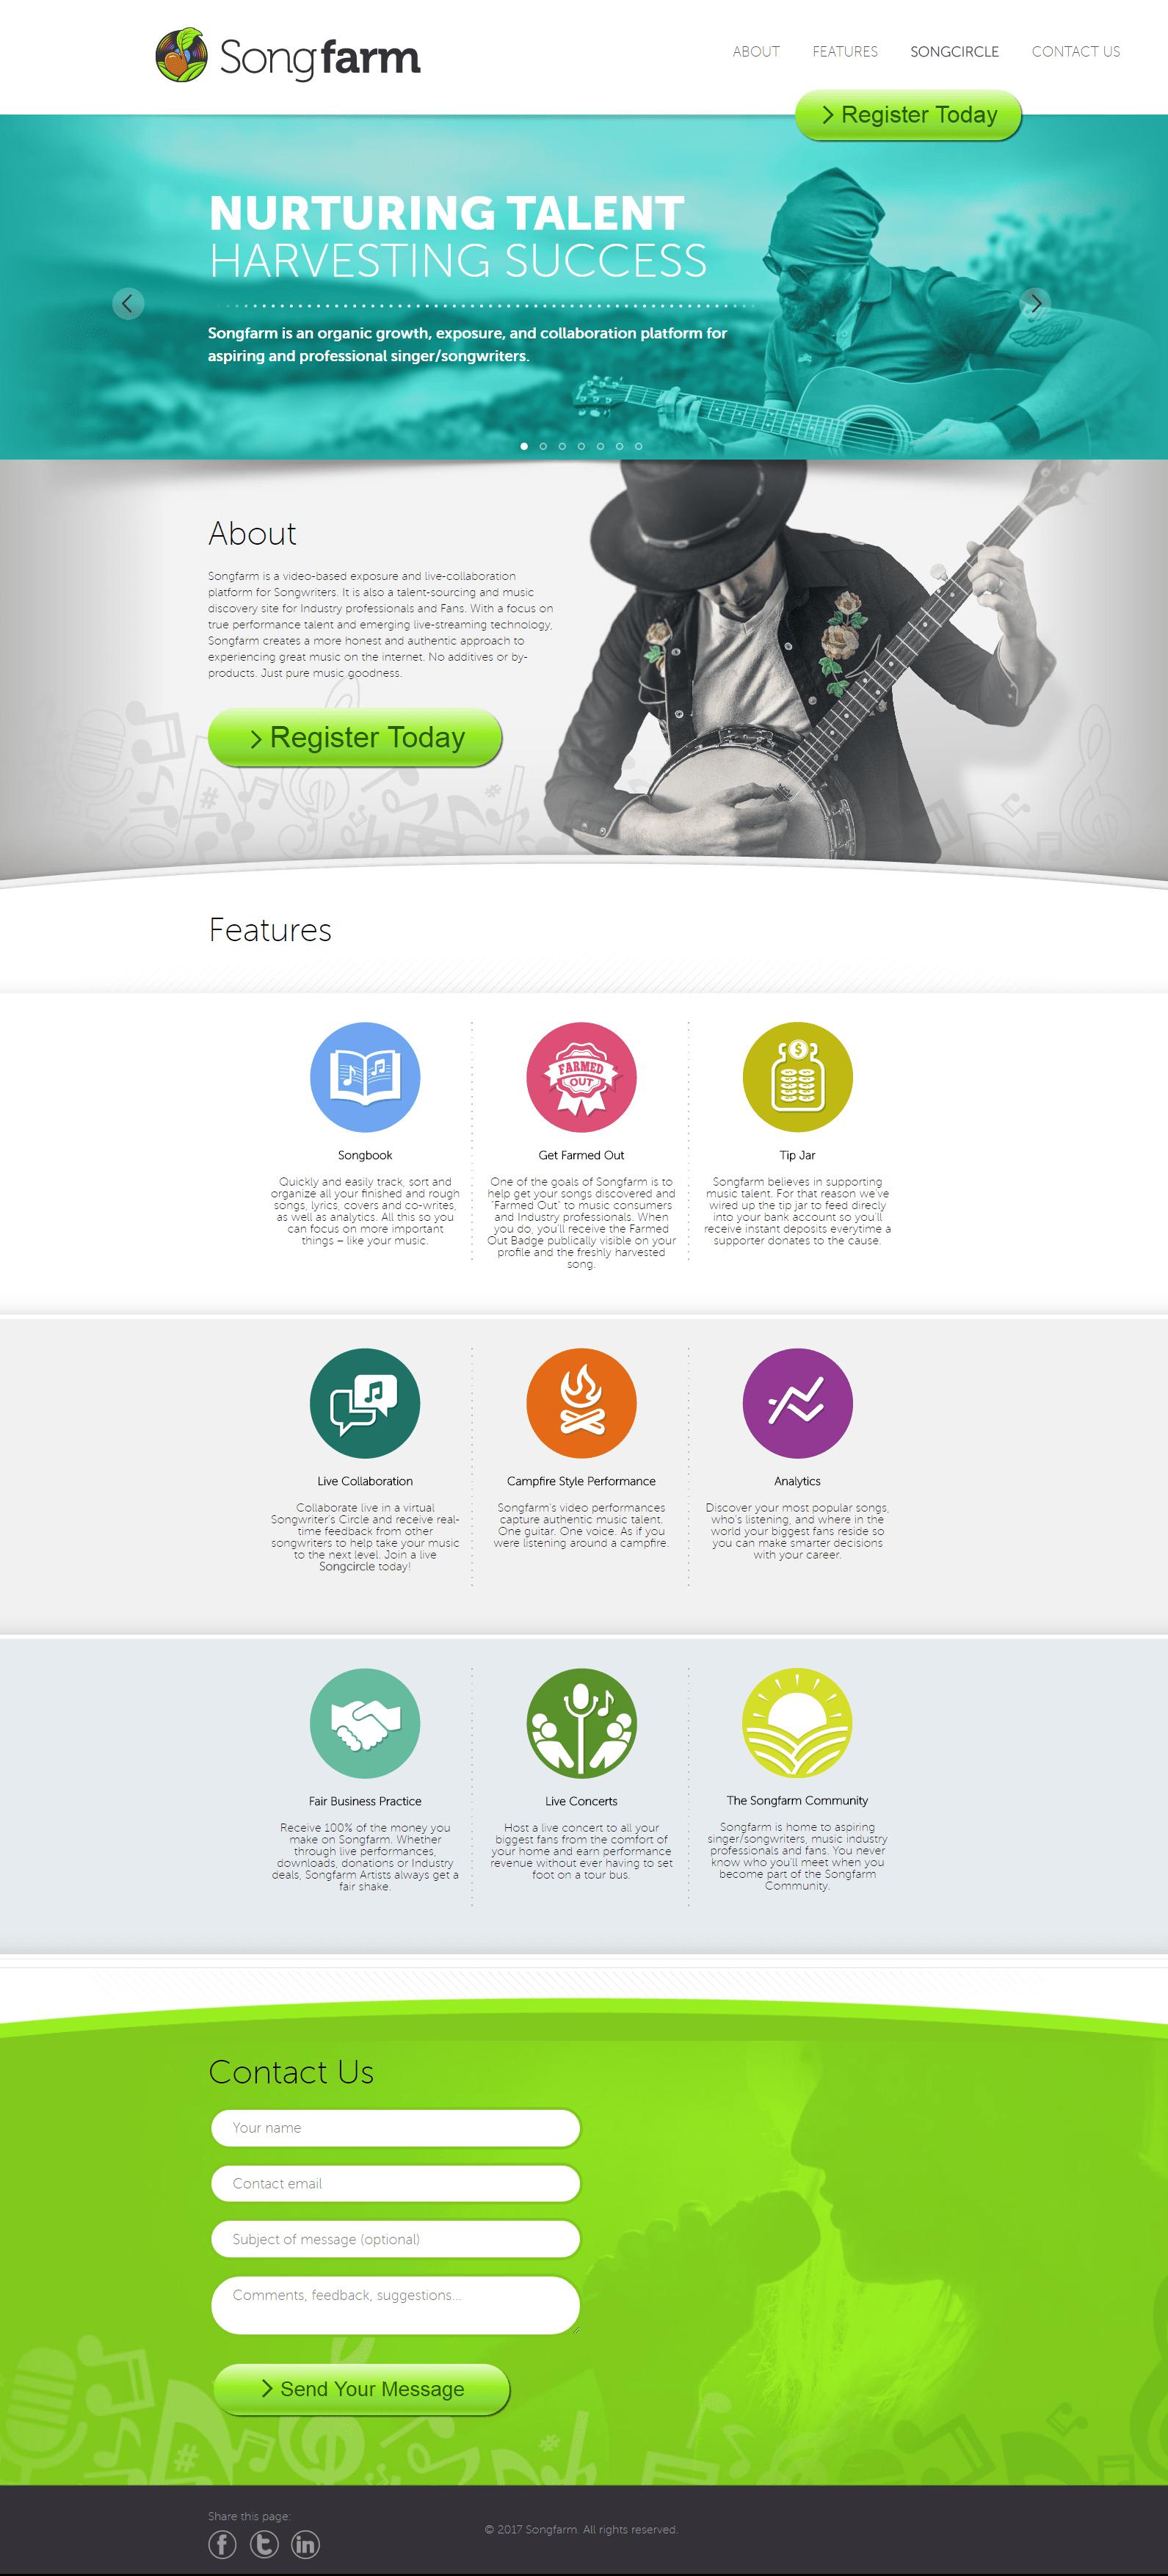 Fullscreen image of Songfarm website